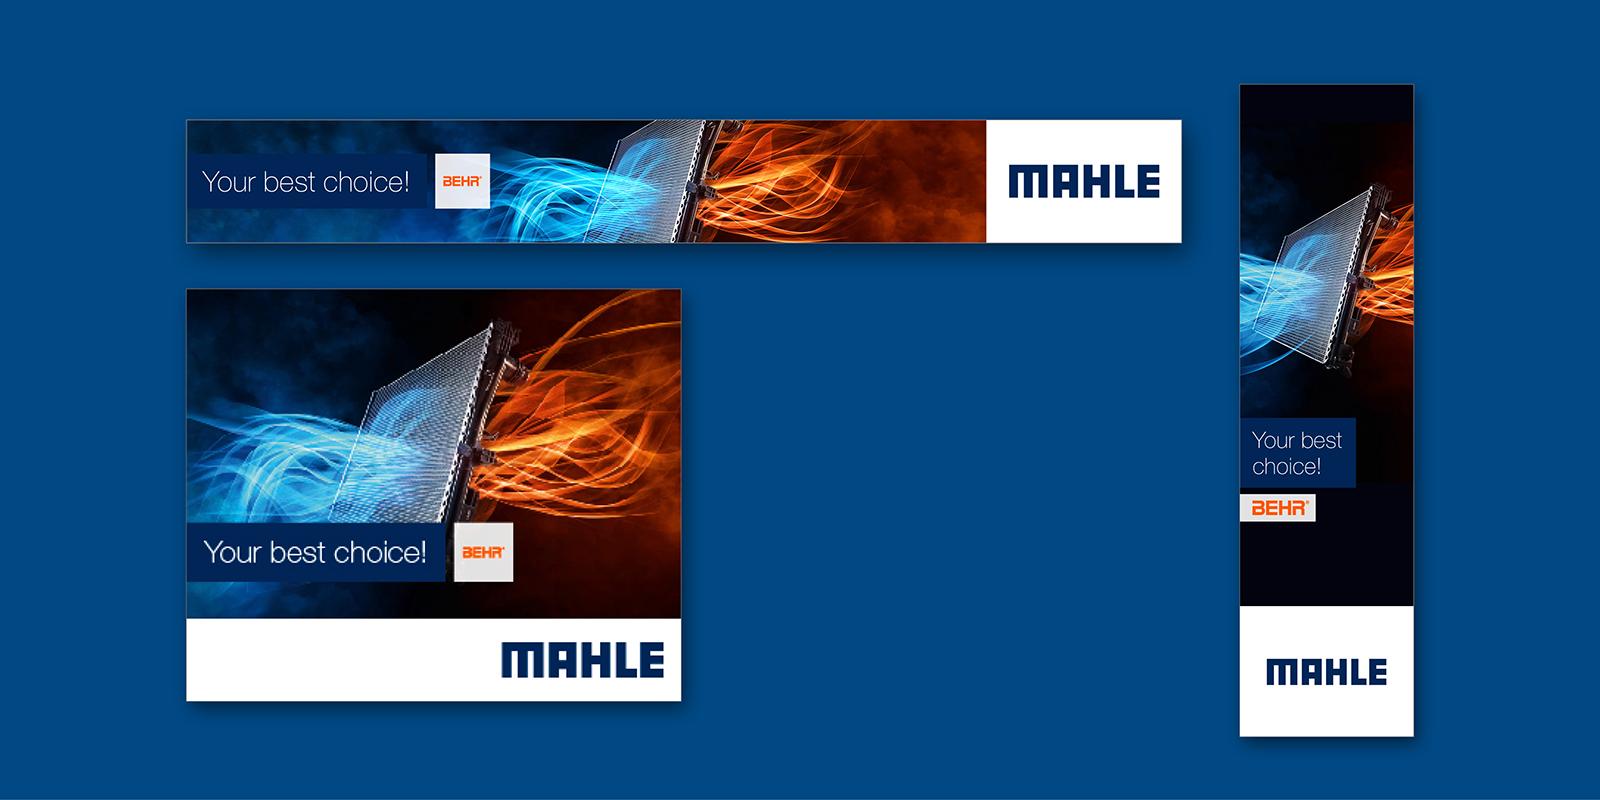 MAHLE Imagekampagne Banner